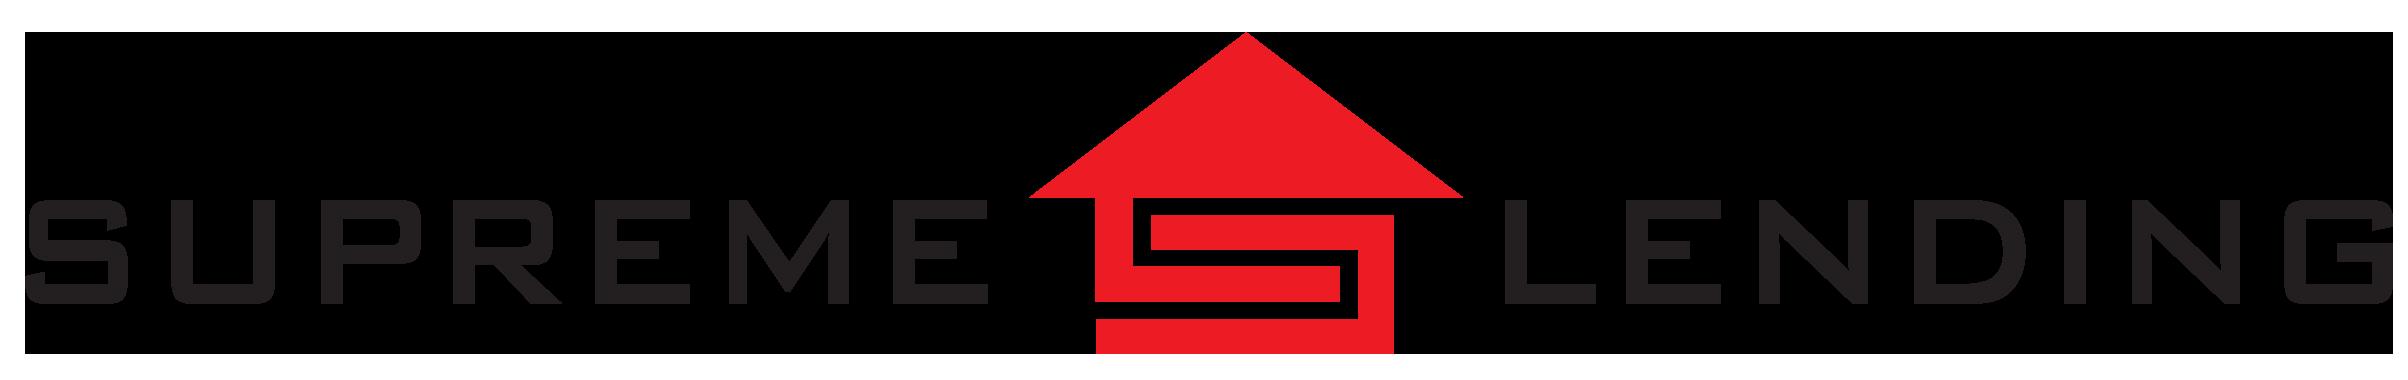 Supreme Lending Horizontal_Large (1).png